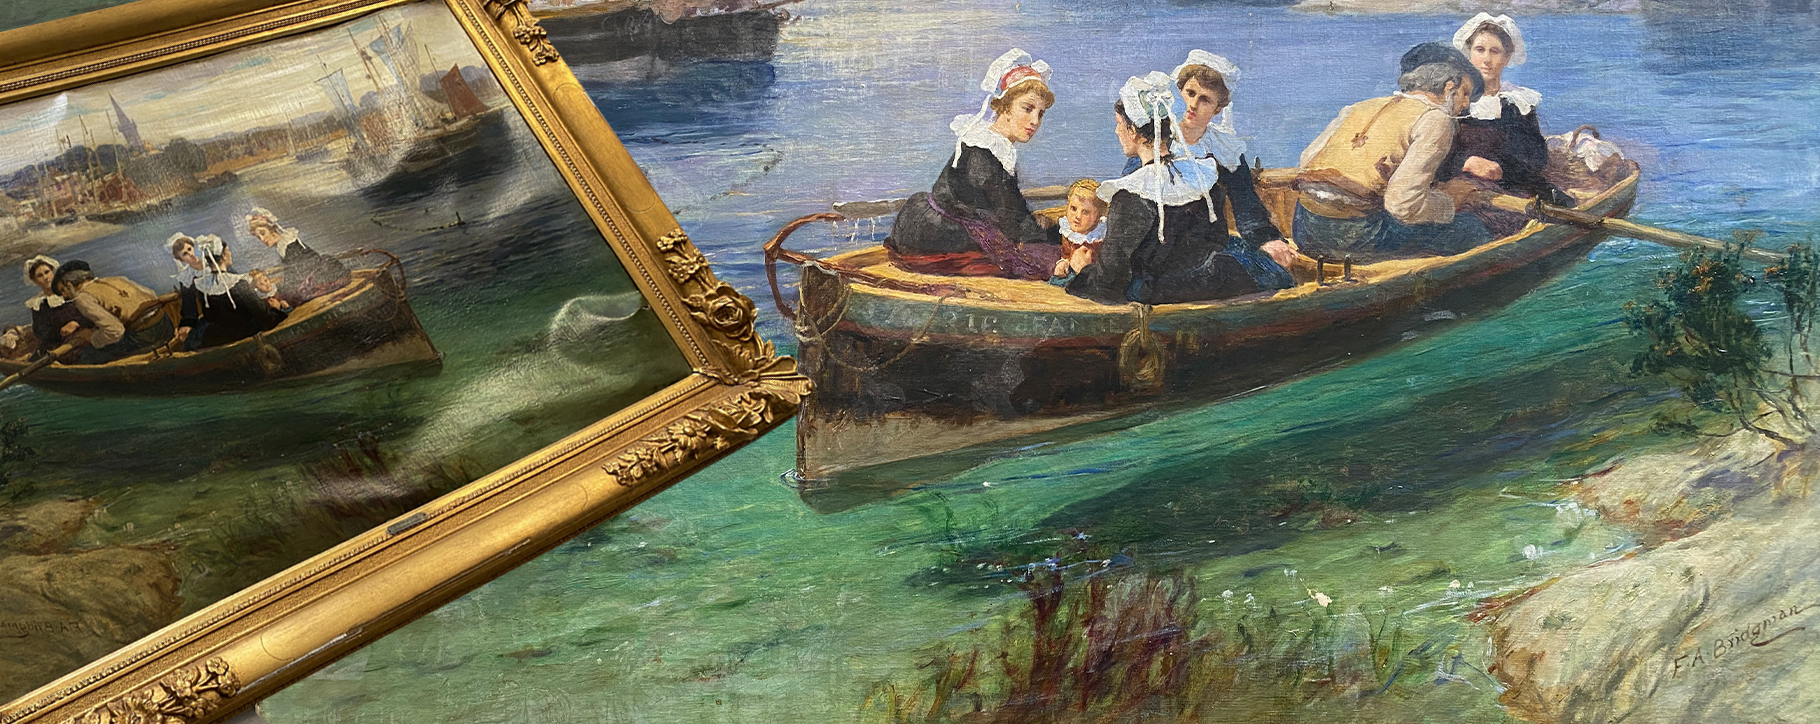 Bridgman Warped Boat Painting